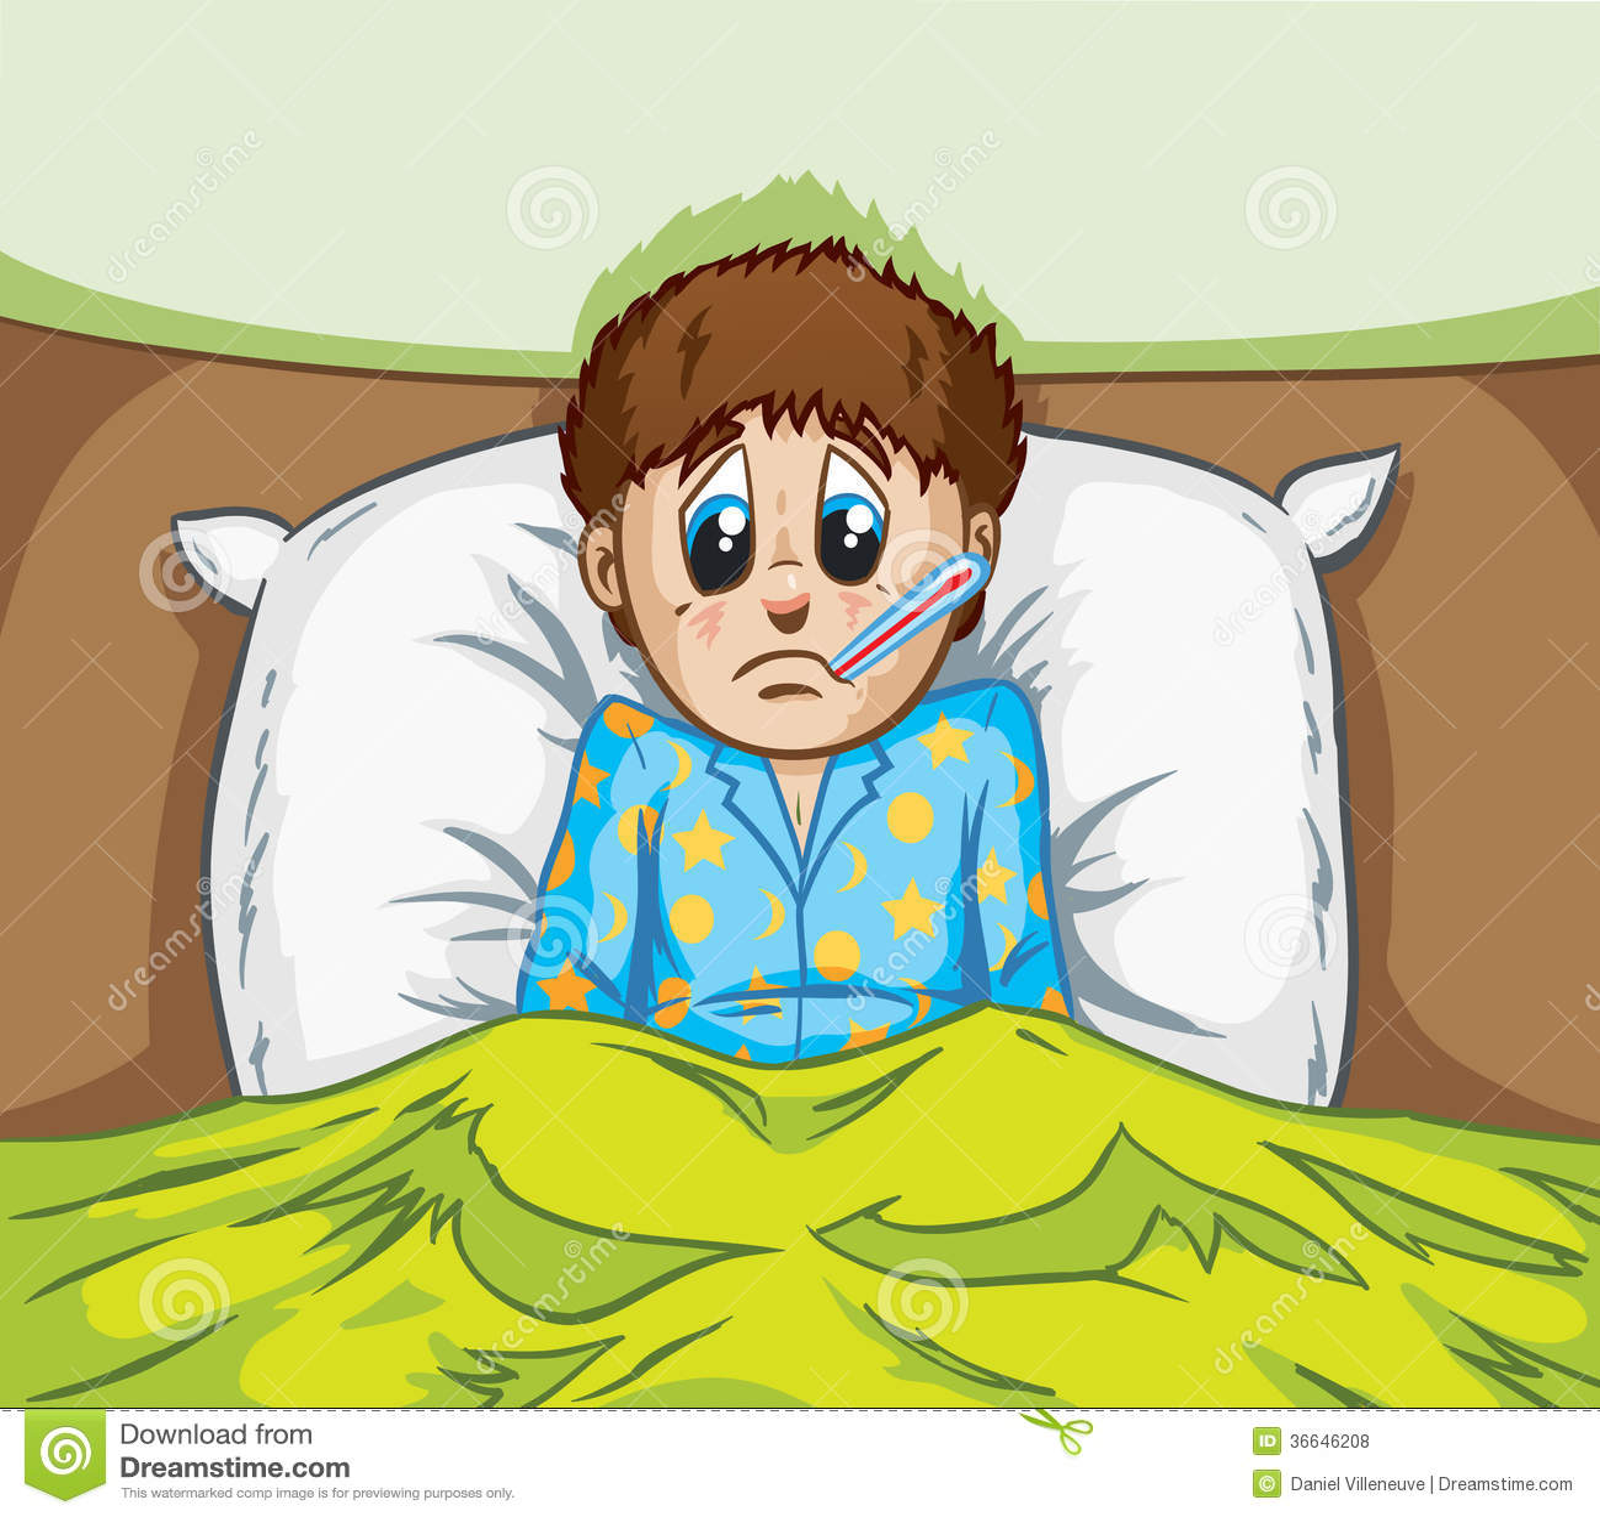 Sick Boy Royalty Free Stock Photos - Image: 36646208